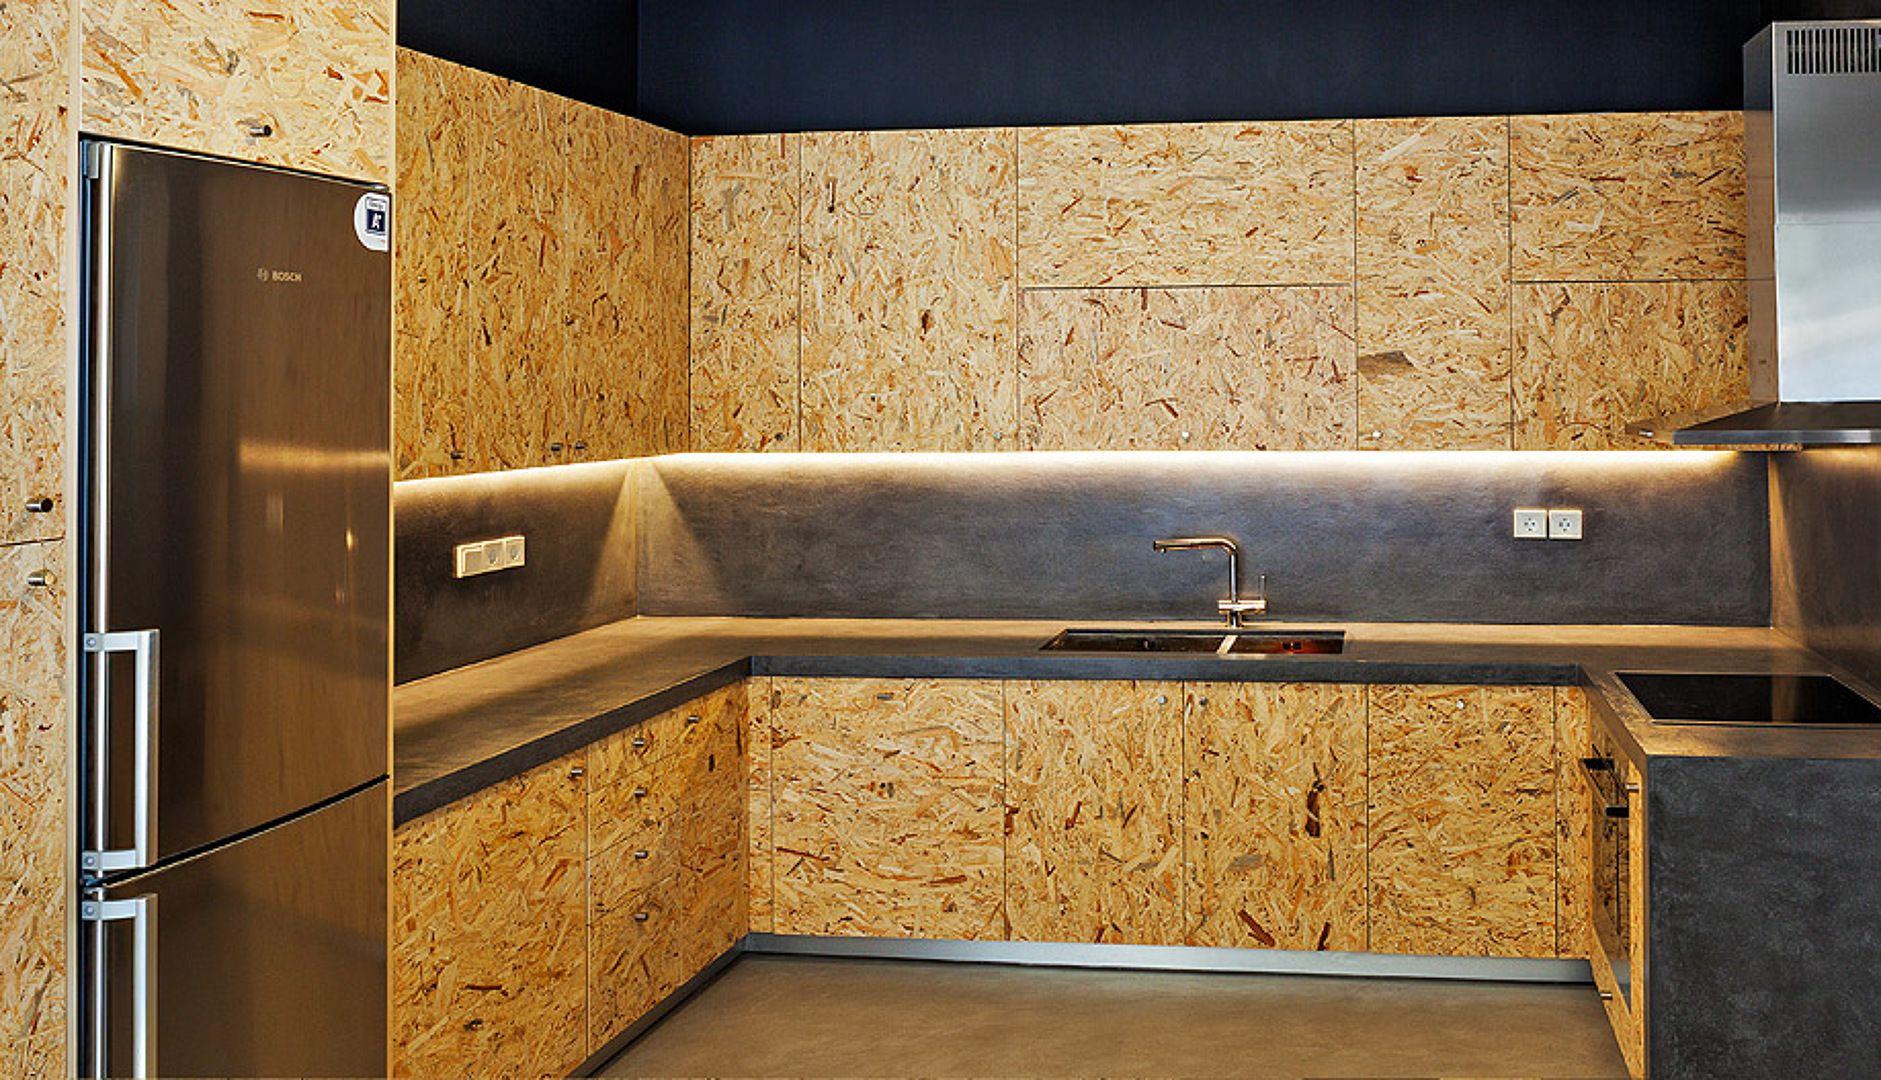 Pannelli Di Legno Osb mobili cucina in obs   arredamento, progetti di cucine, idee